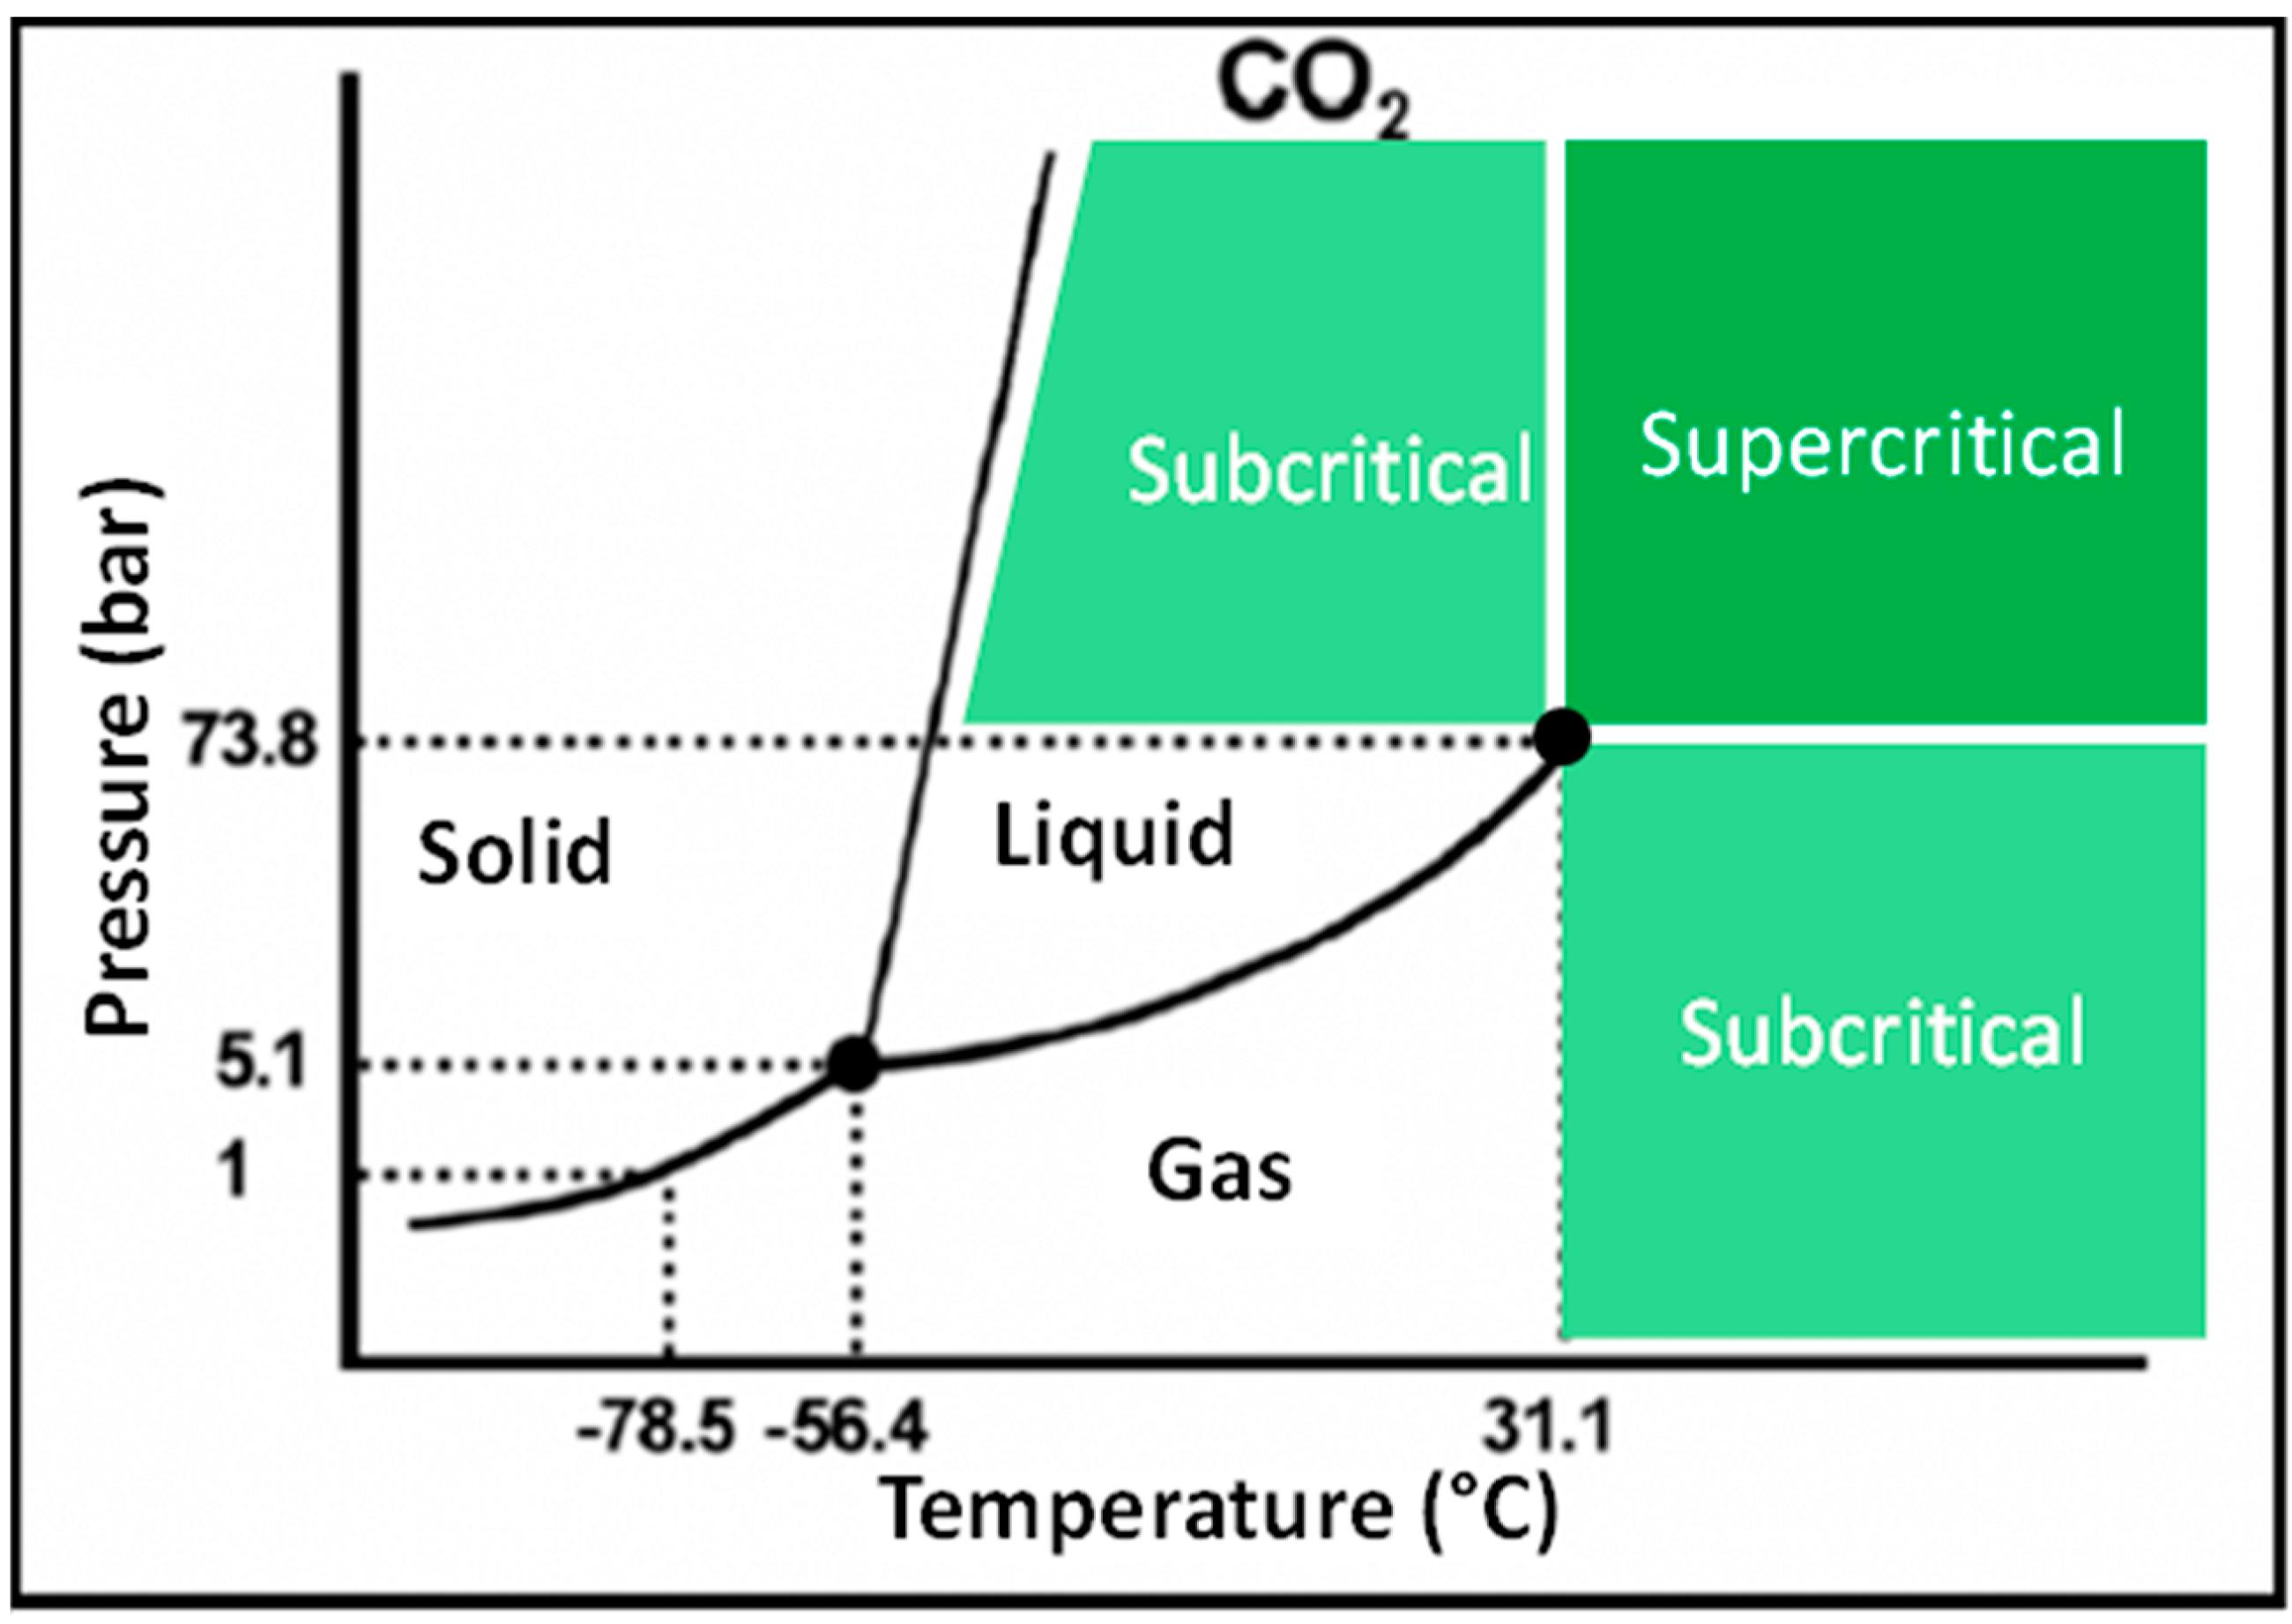 supercritical phase diagram of co2 printable diagram [ 2600 x 1842 Pixel ]